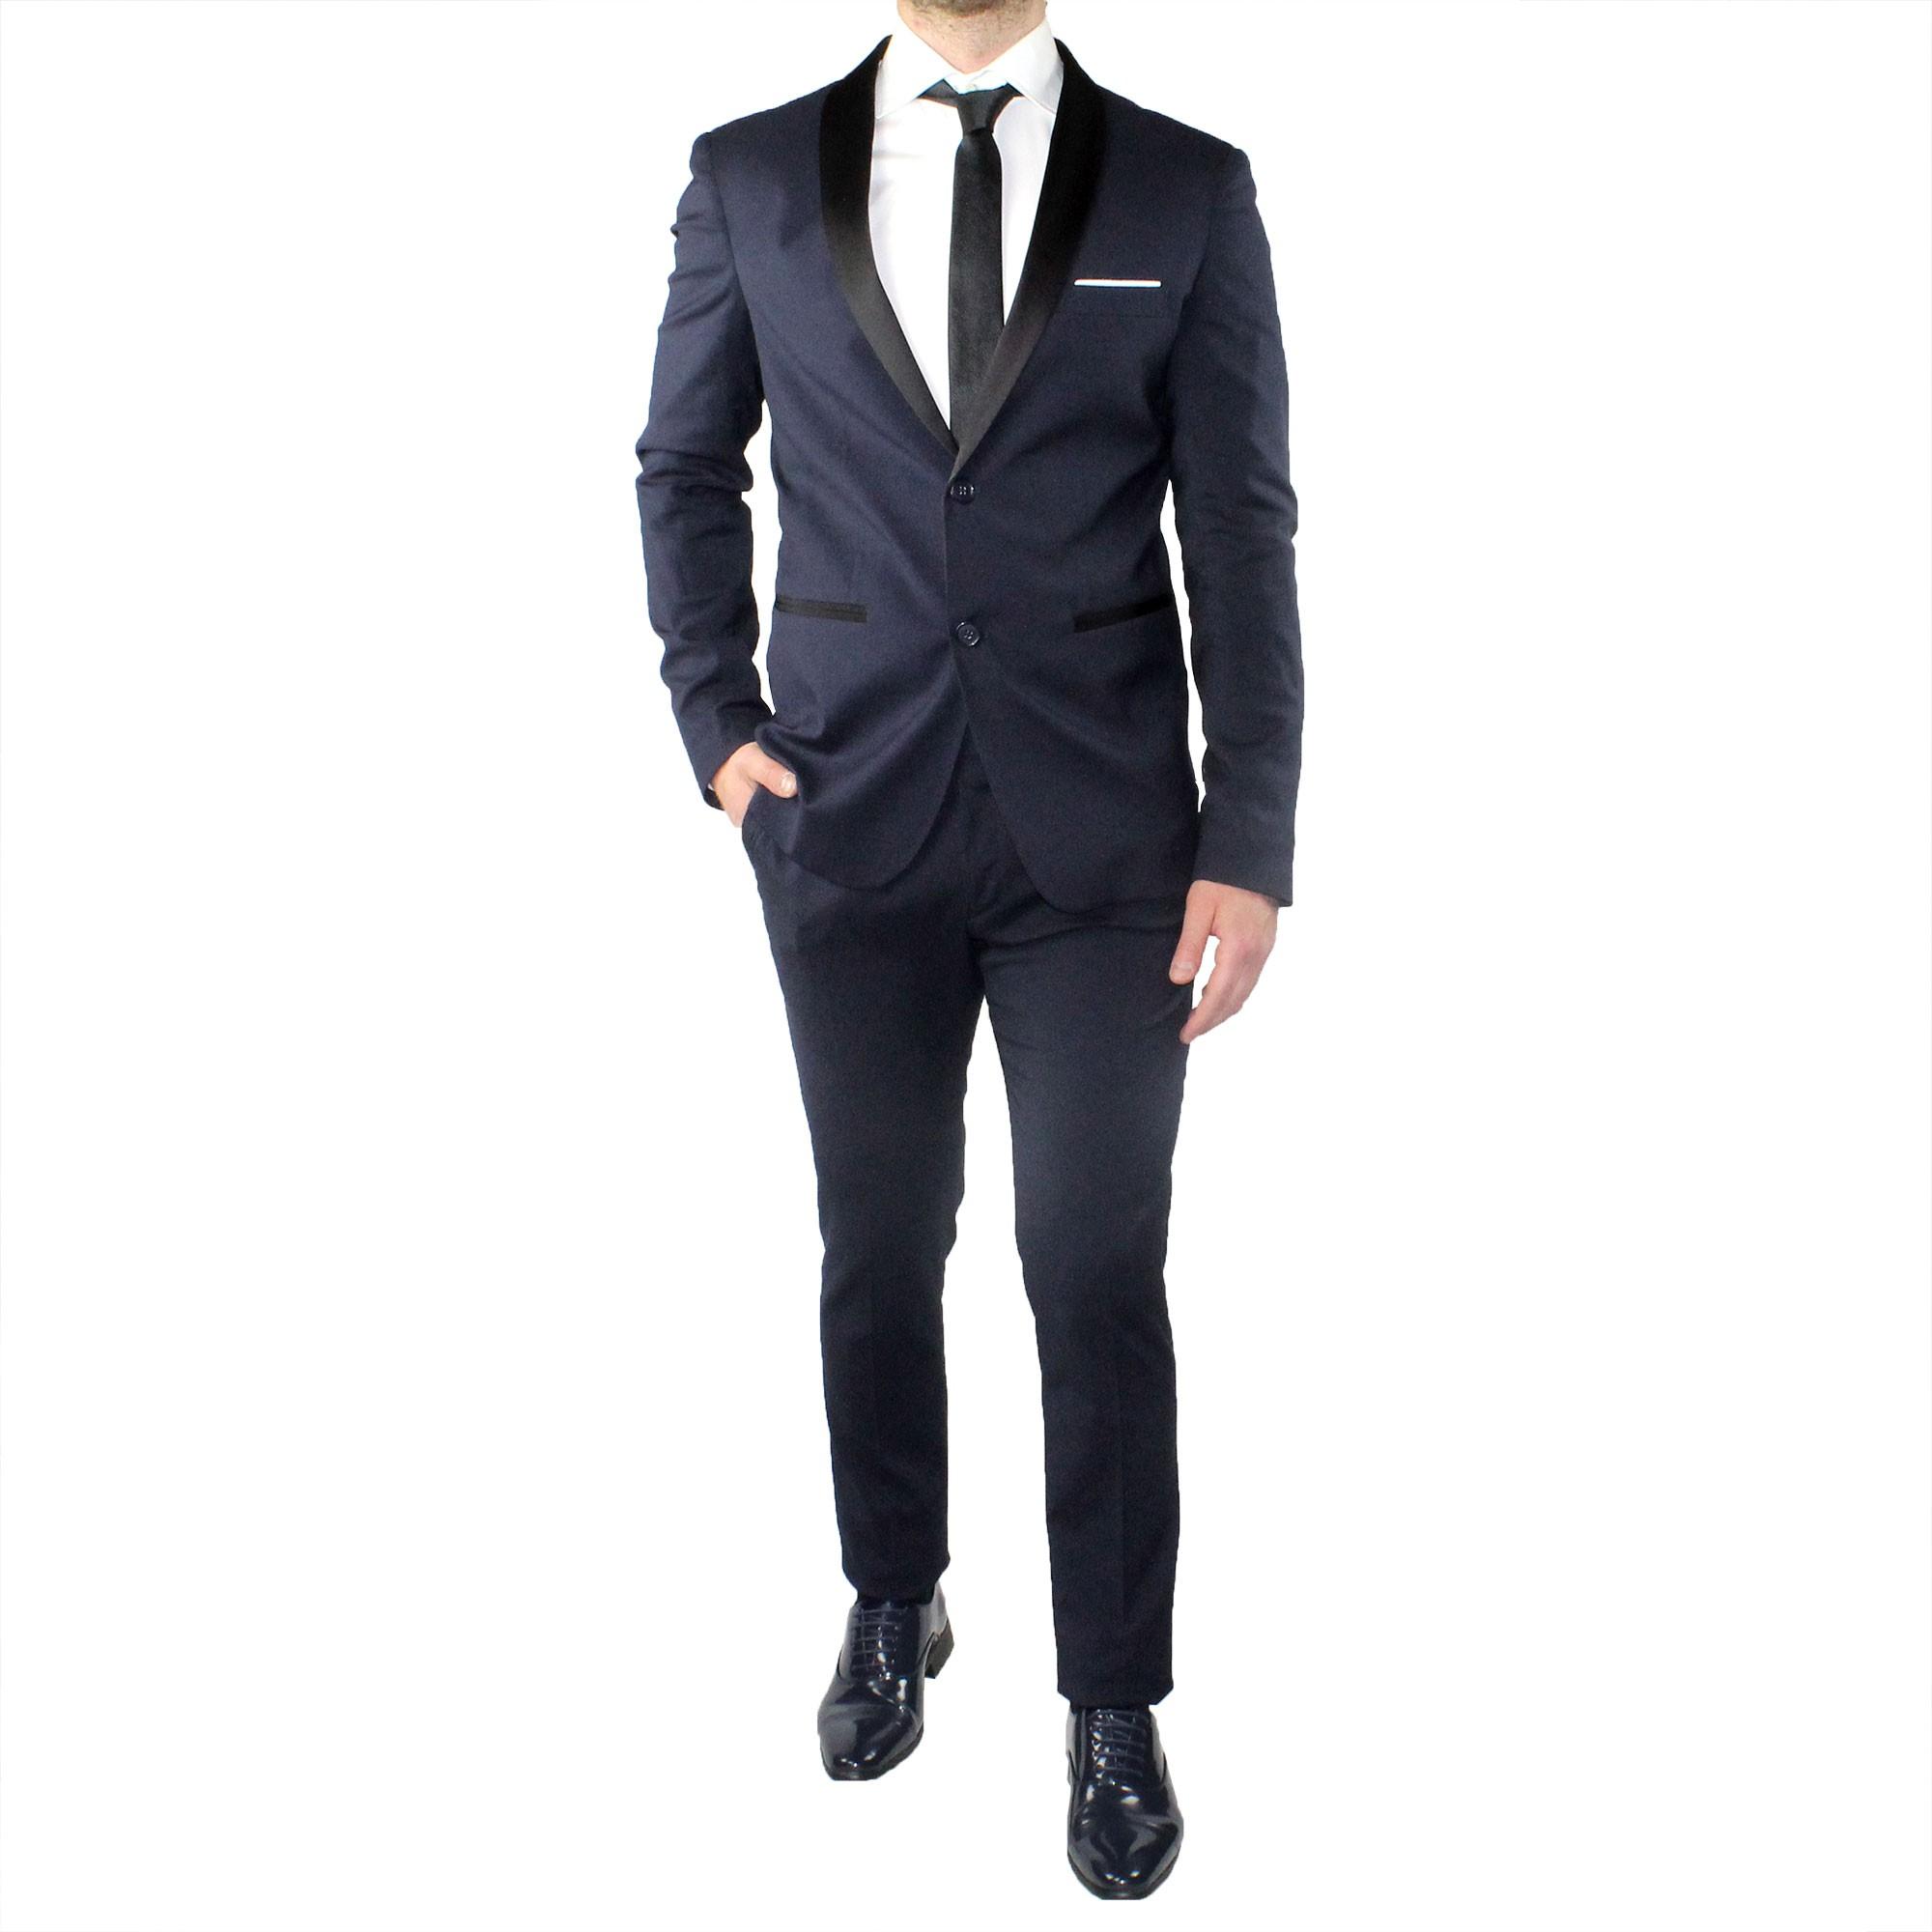 Abito-Uomo-Smoking-Elegante-Vestito-Completo-Estivo-Cerimonia-Sartoriale-Slim miniatura 4